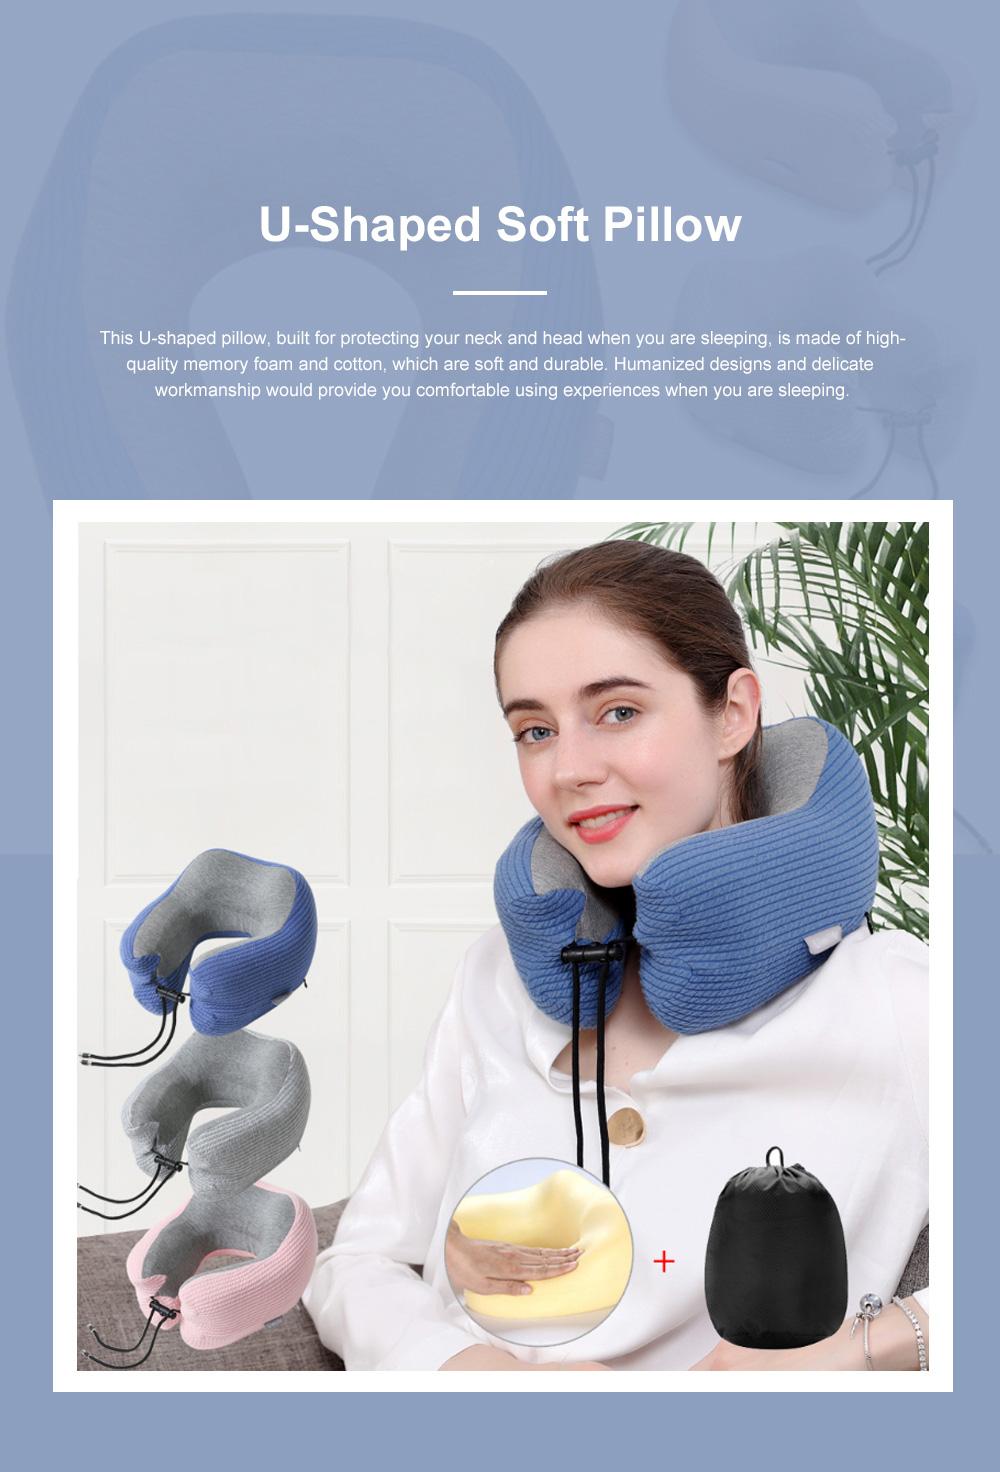 Slow Rebound Memory Foam U-Shaped Soft Pillow, Functional Office School Noon Break Pillow with Adjustable String Buckle 0